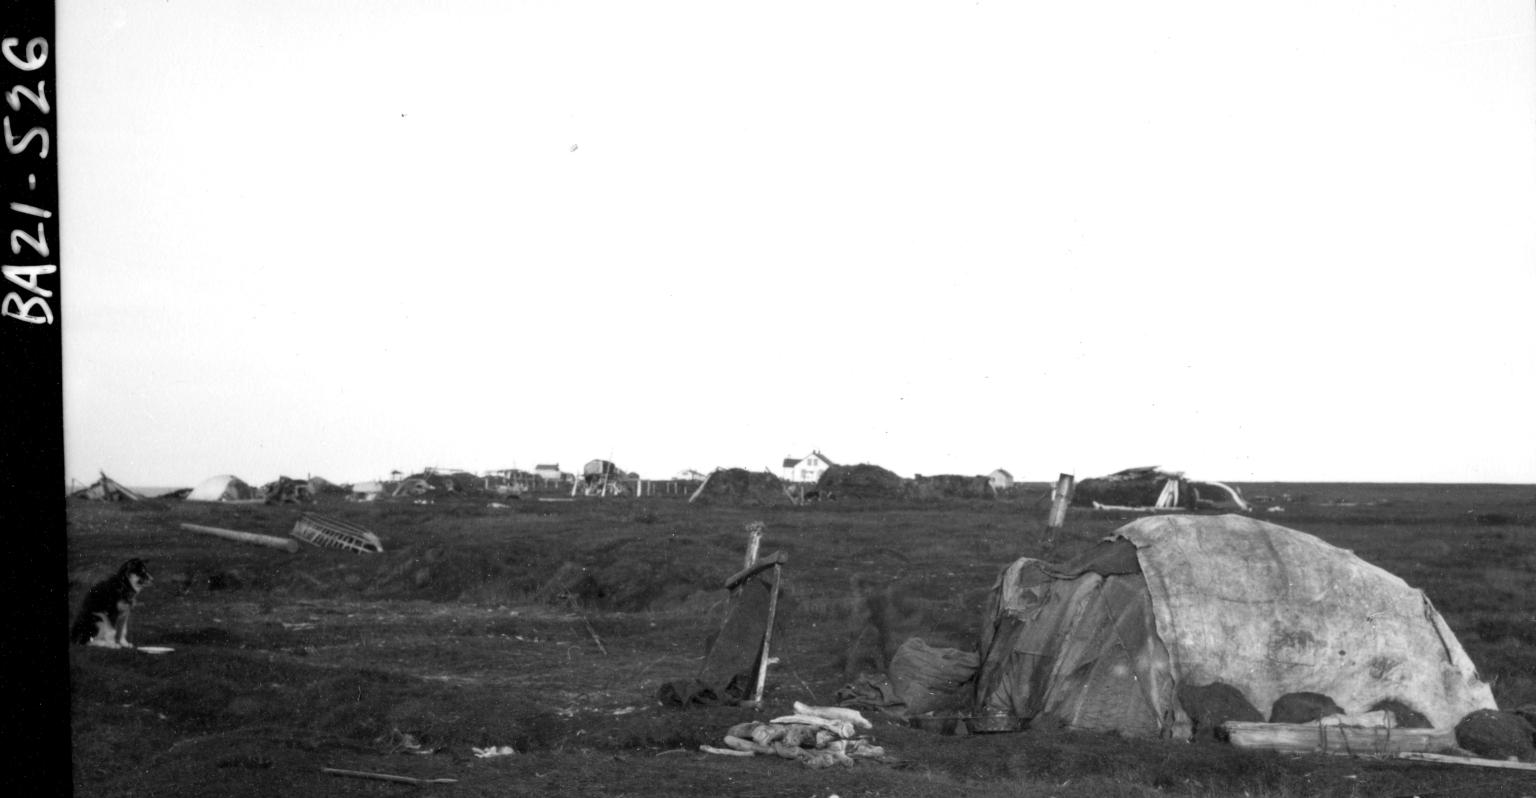 Wainwright Village